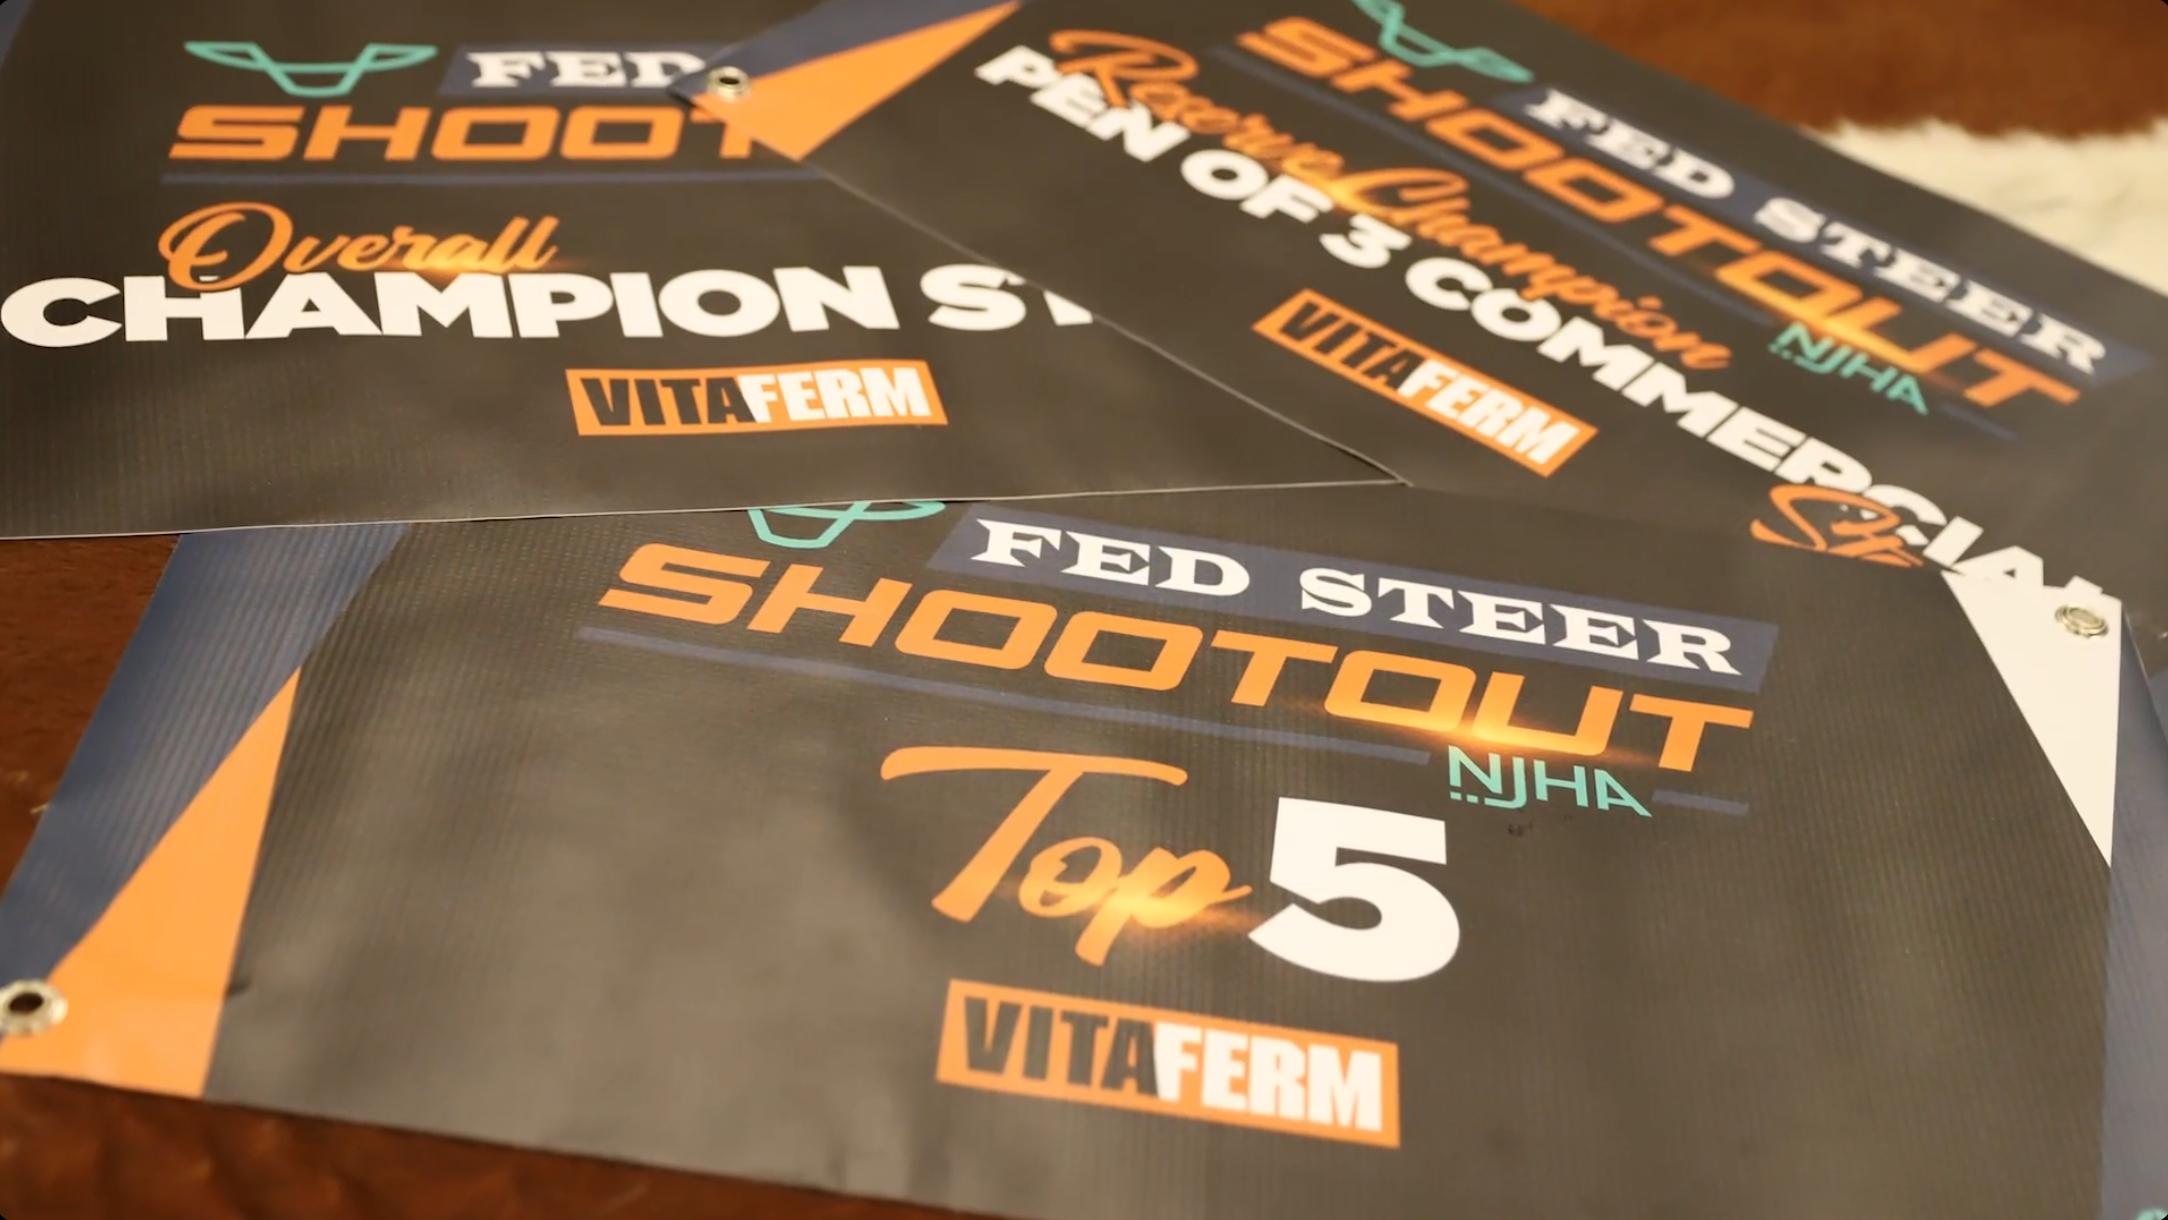 NJHA Fed Steer Shootout Contest Winners Named